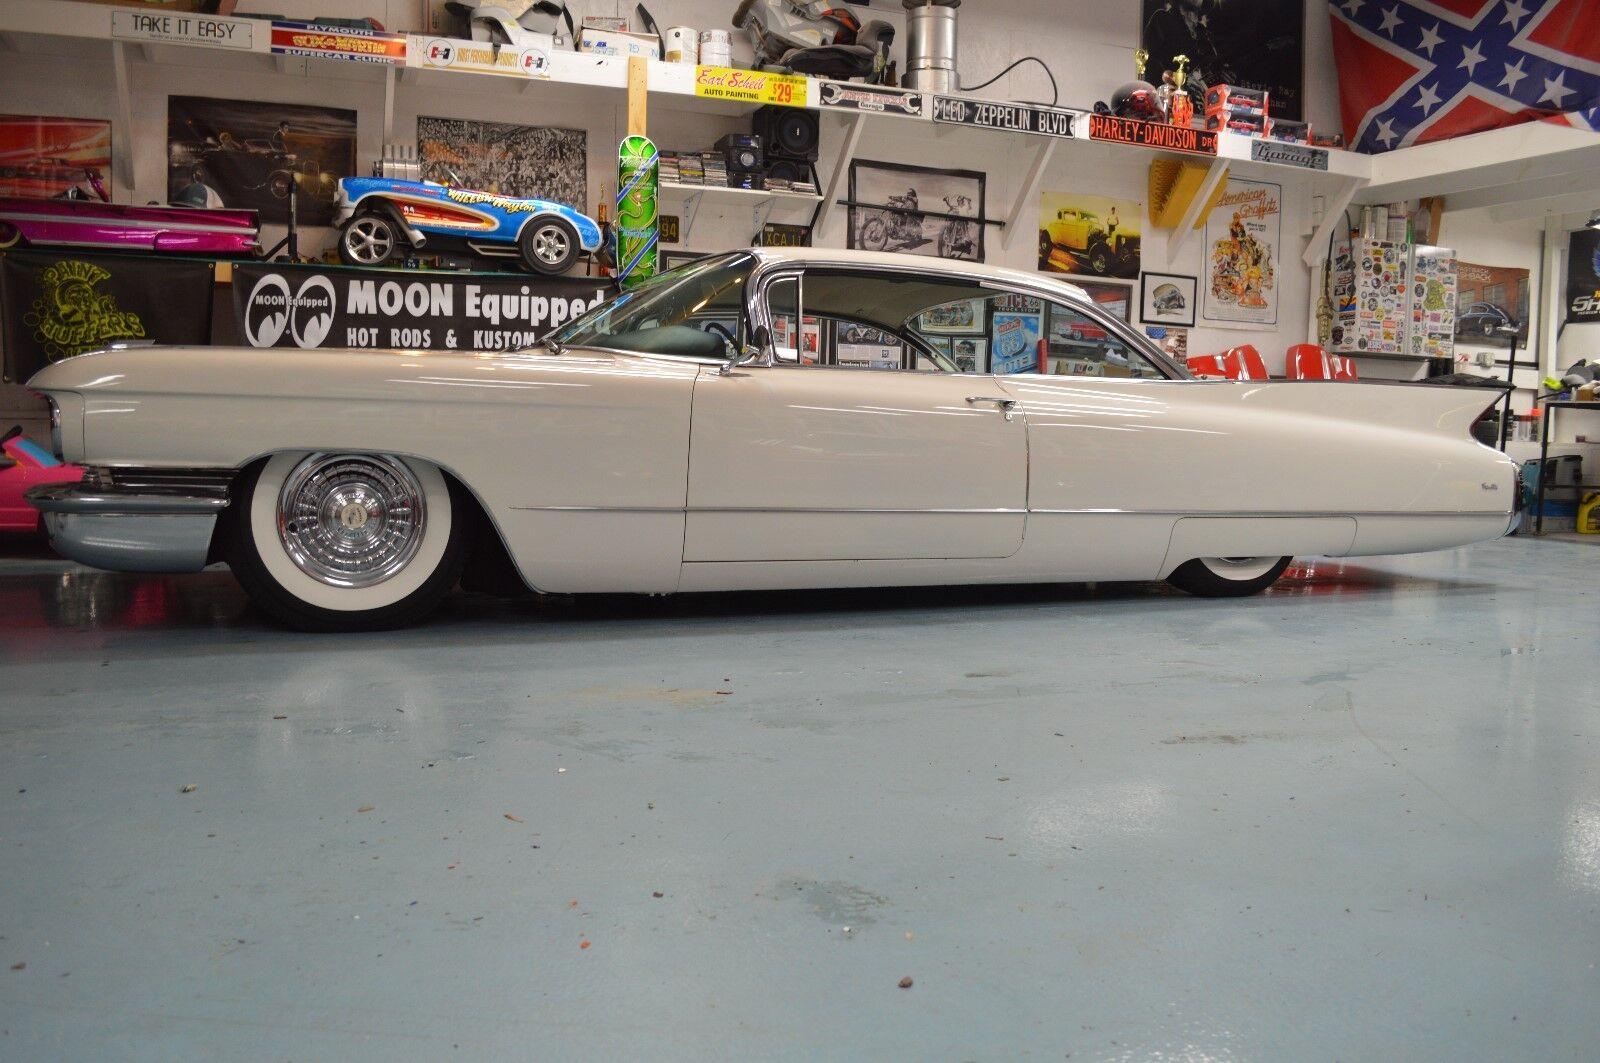 1960 Cadillac DeVille Series 62 1960 Cadillac Series 62 Coupe Bagged AirRide Original